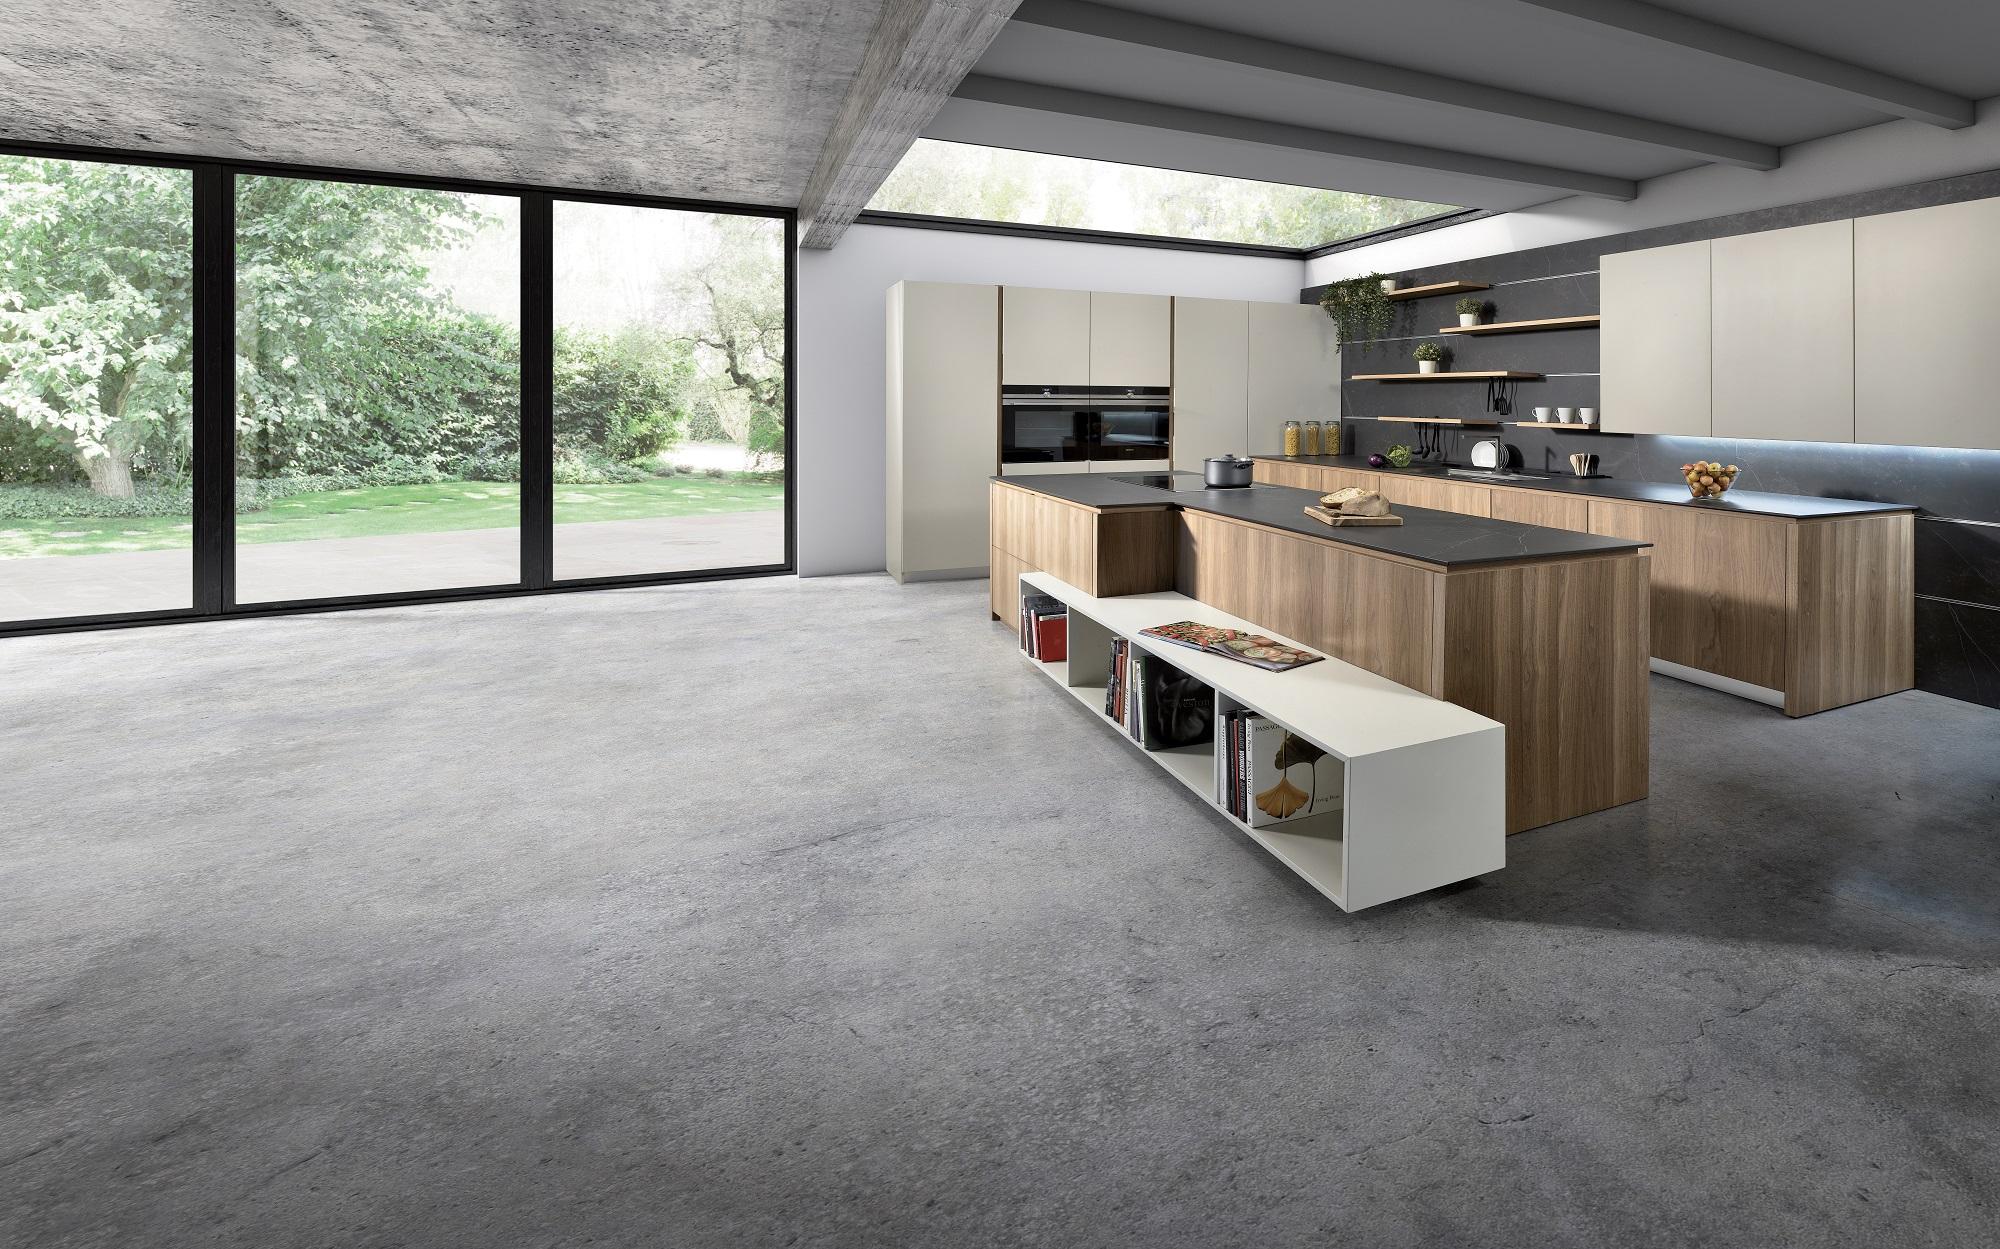 Lady Cucine arredamento: cucine, living, camere da letto - Lady Cucine